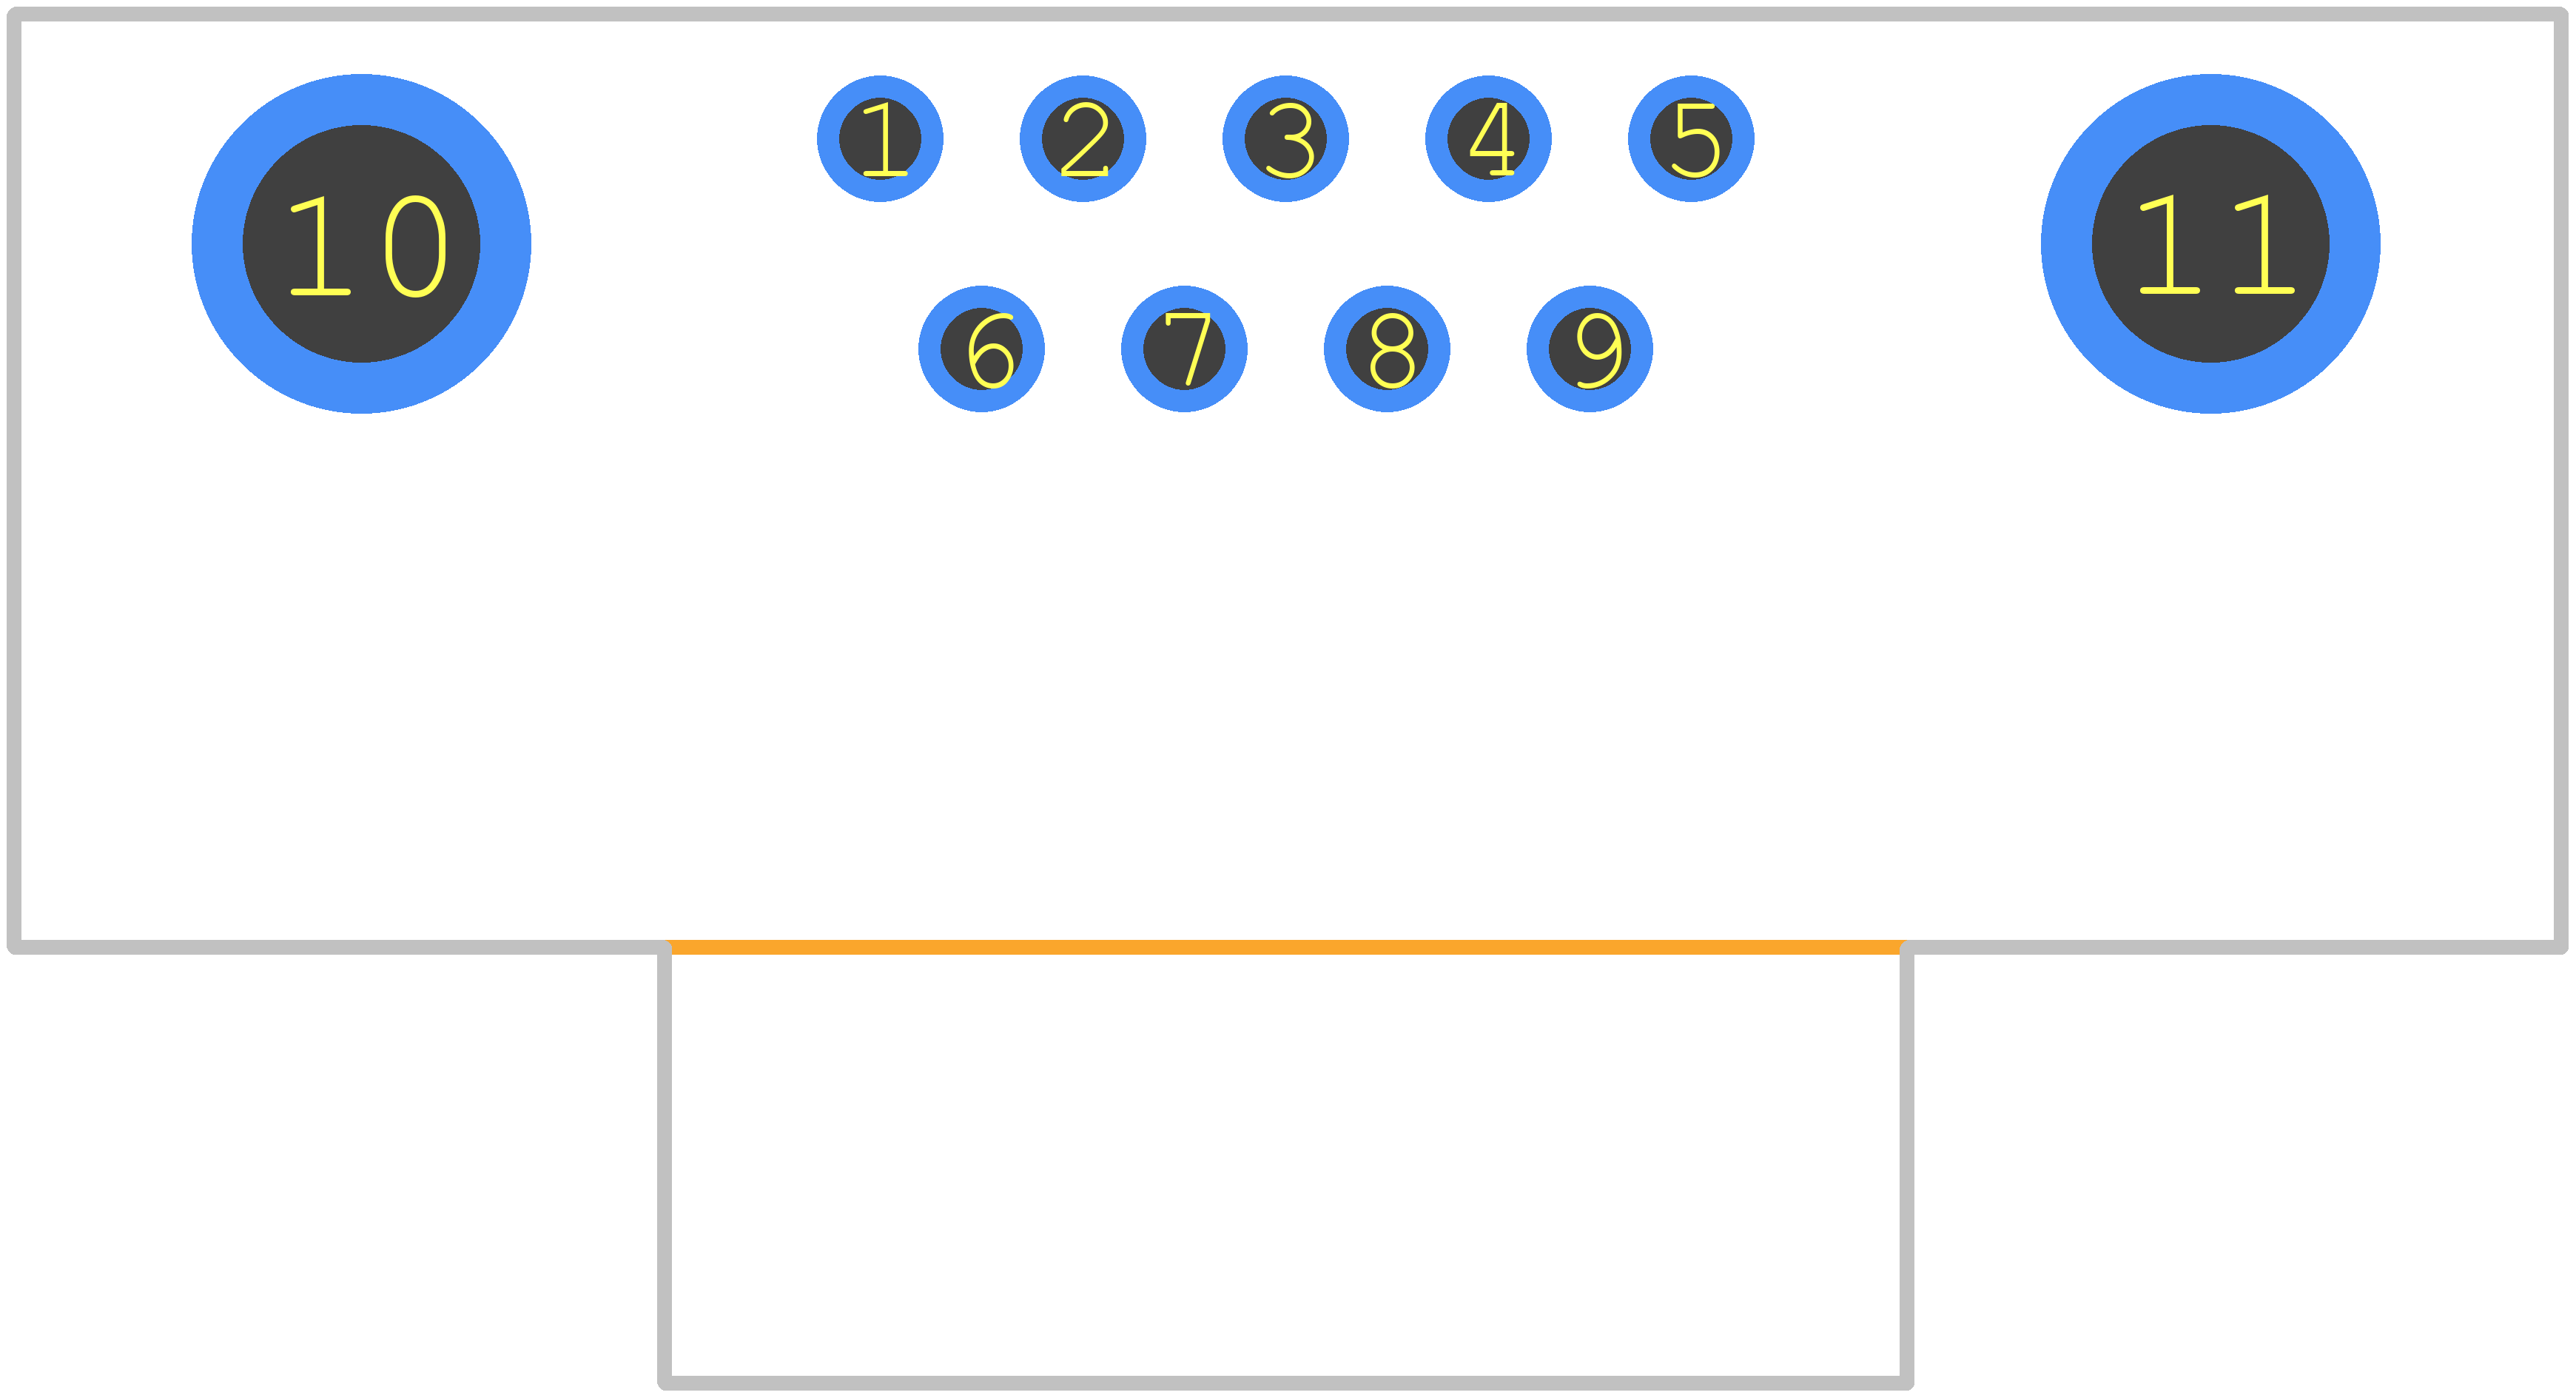 LD09P33E4GV00LF - FCI PCB footprint - Other - LD09P33E4GV00LF